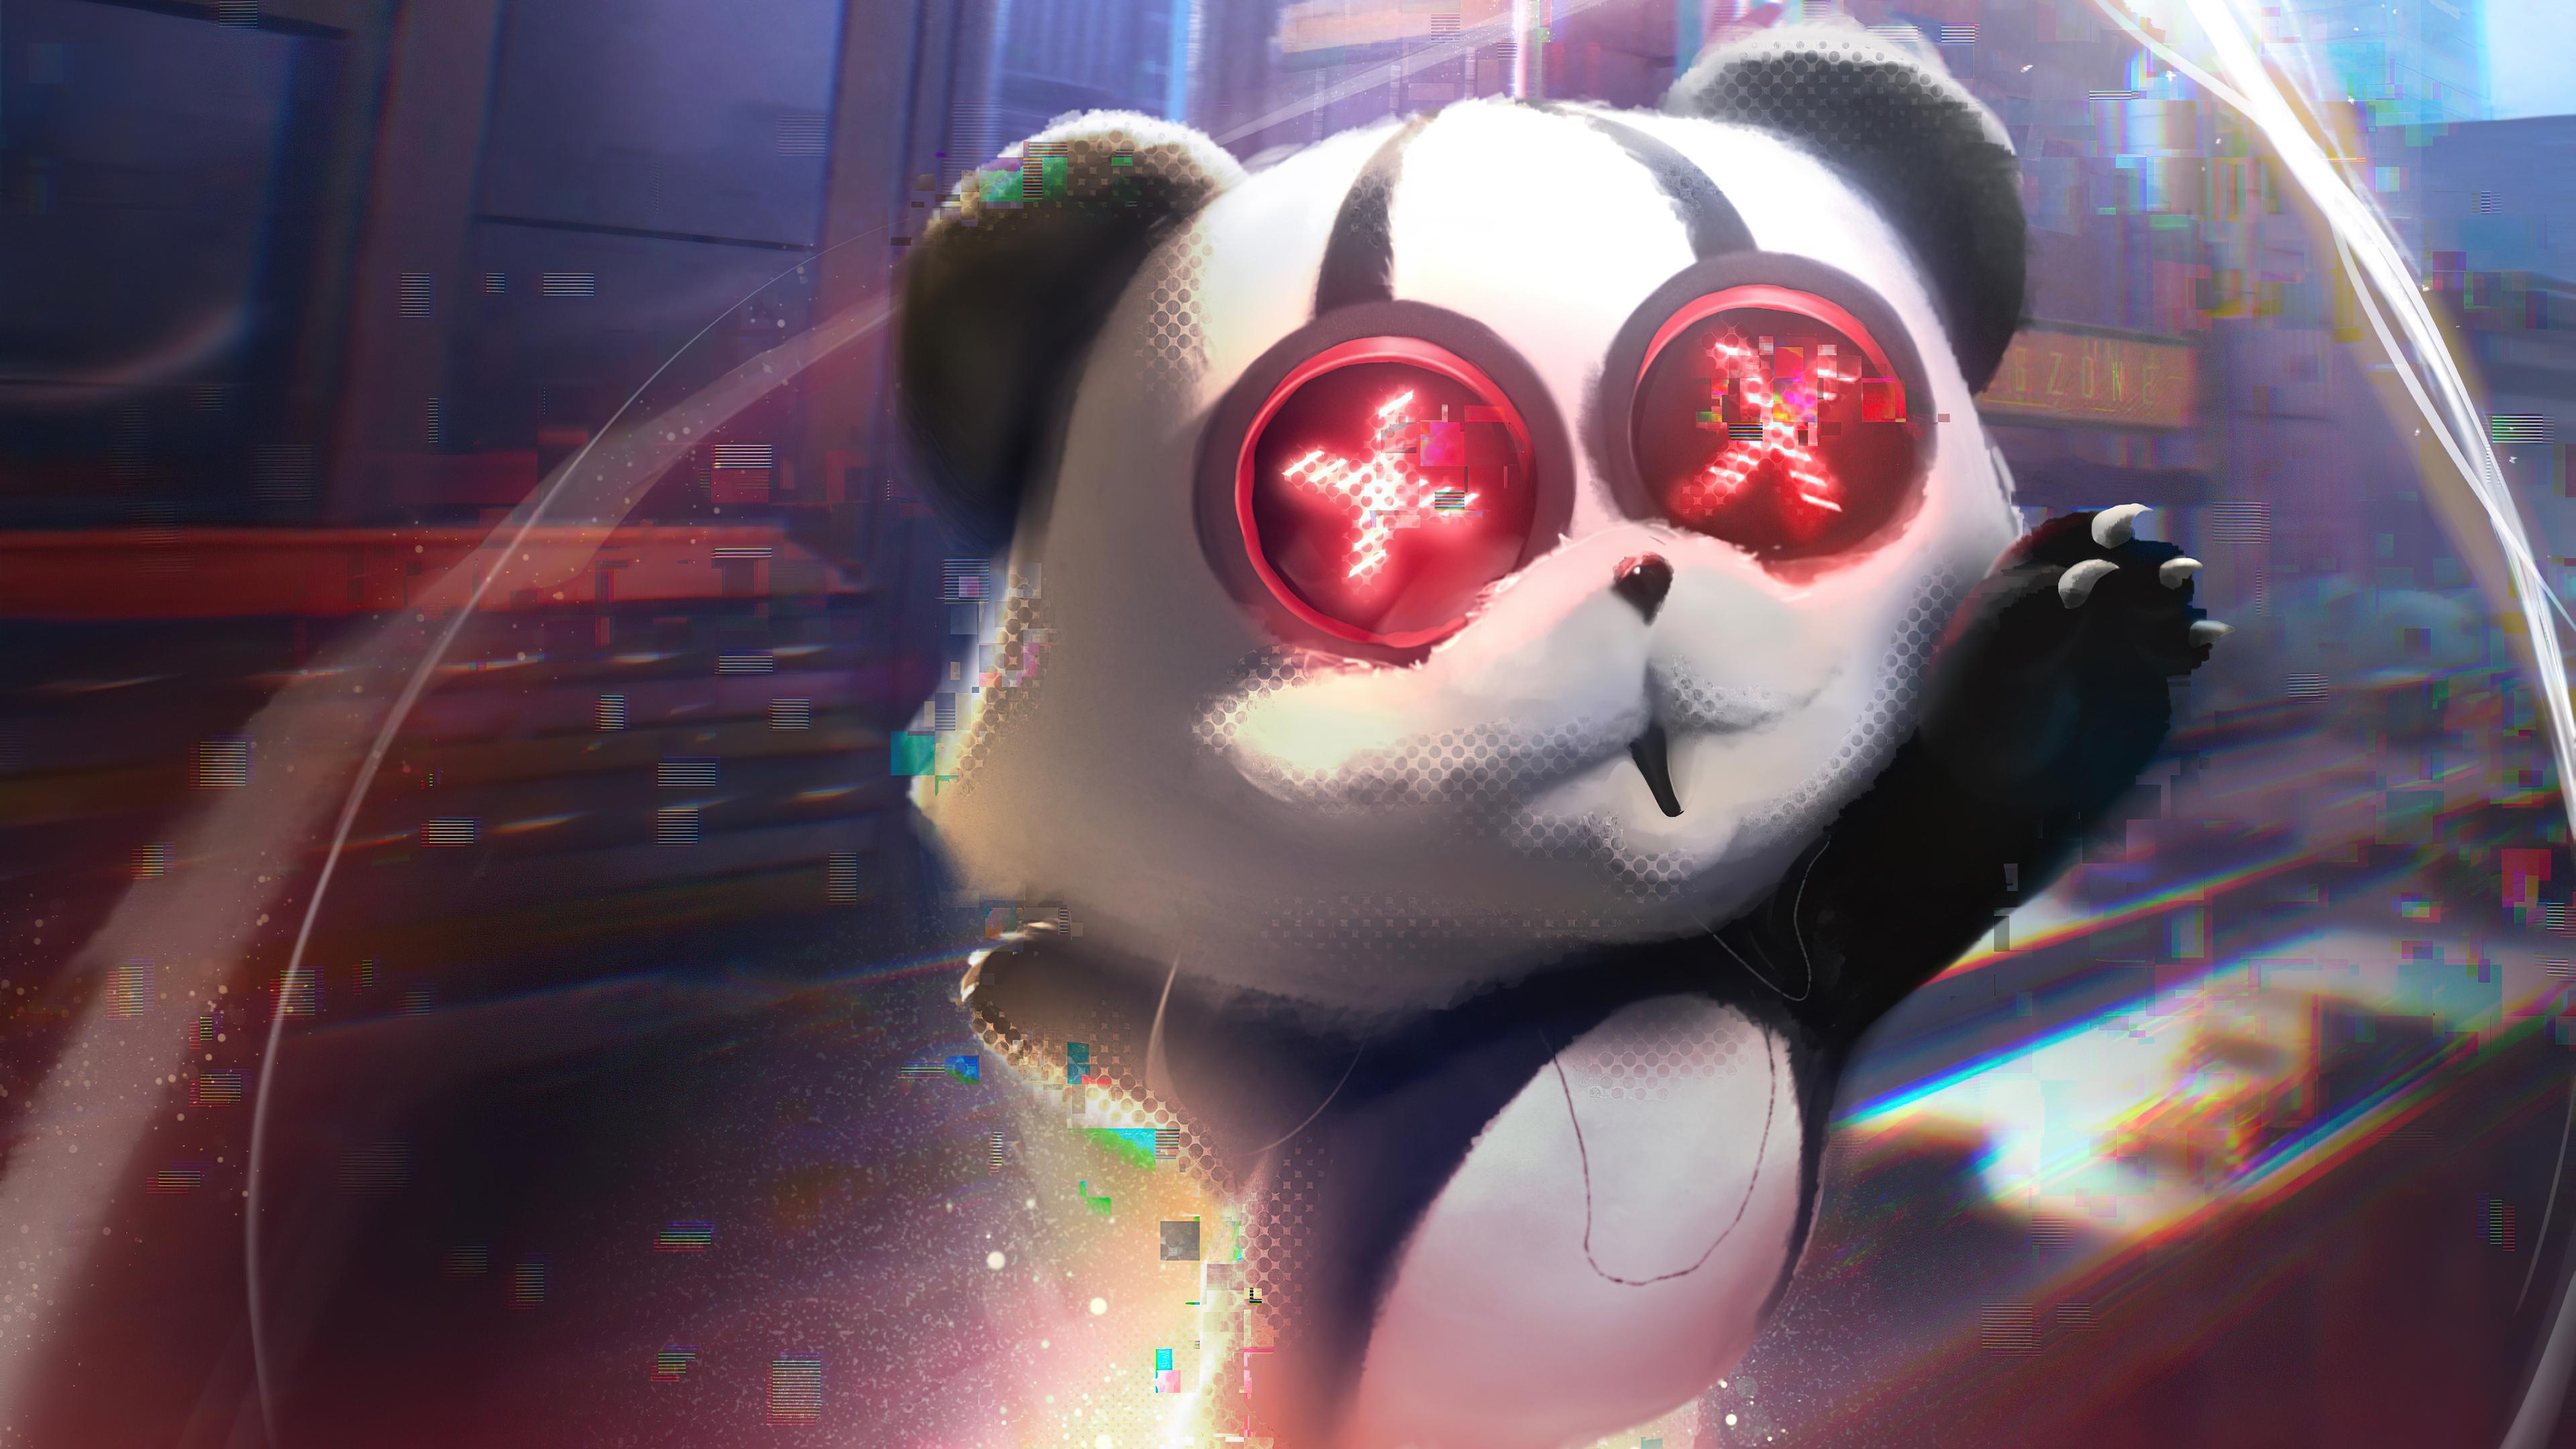 panda cyber city 4k 1608658977 - Panda Cyber City 4k - Panda Cyber City 4k wallpapers